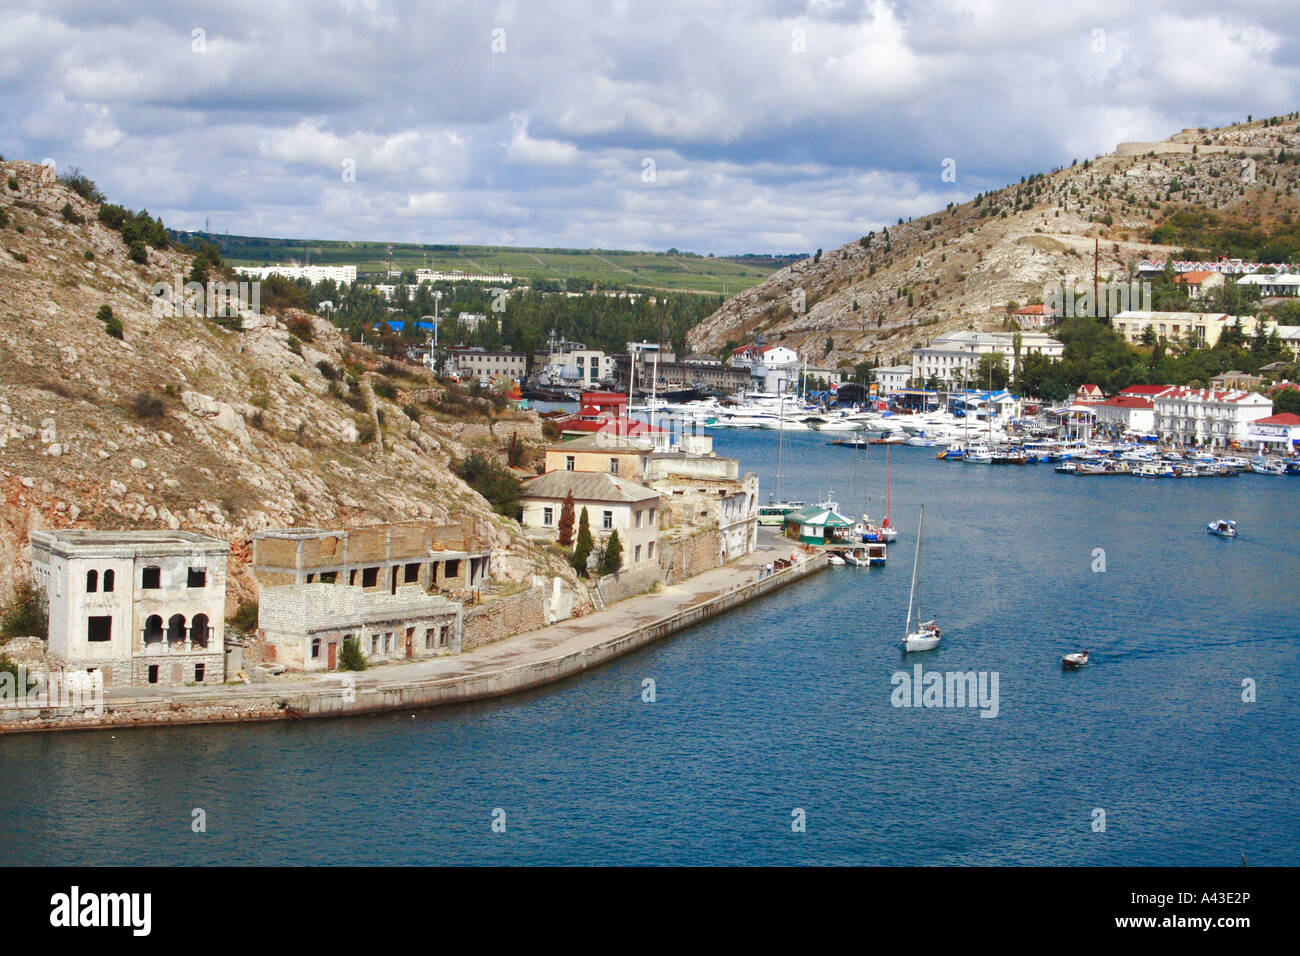 Balaklava Crimea Ukraine - Stock Image